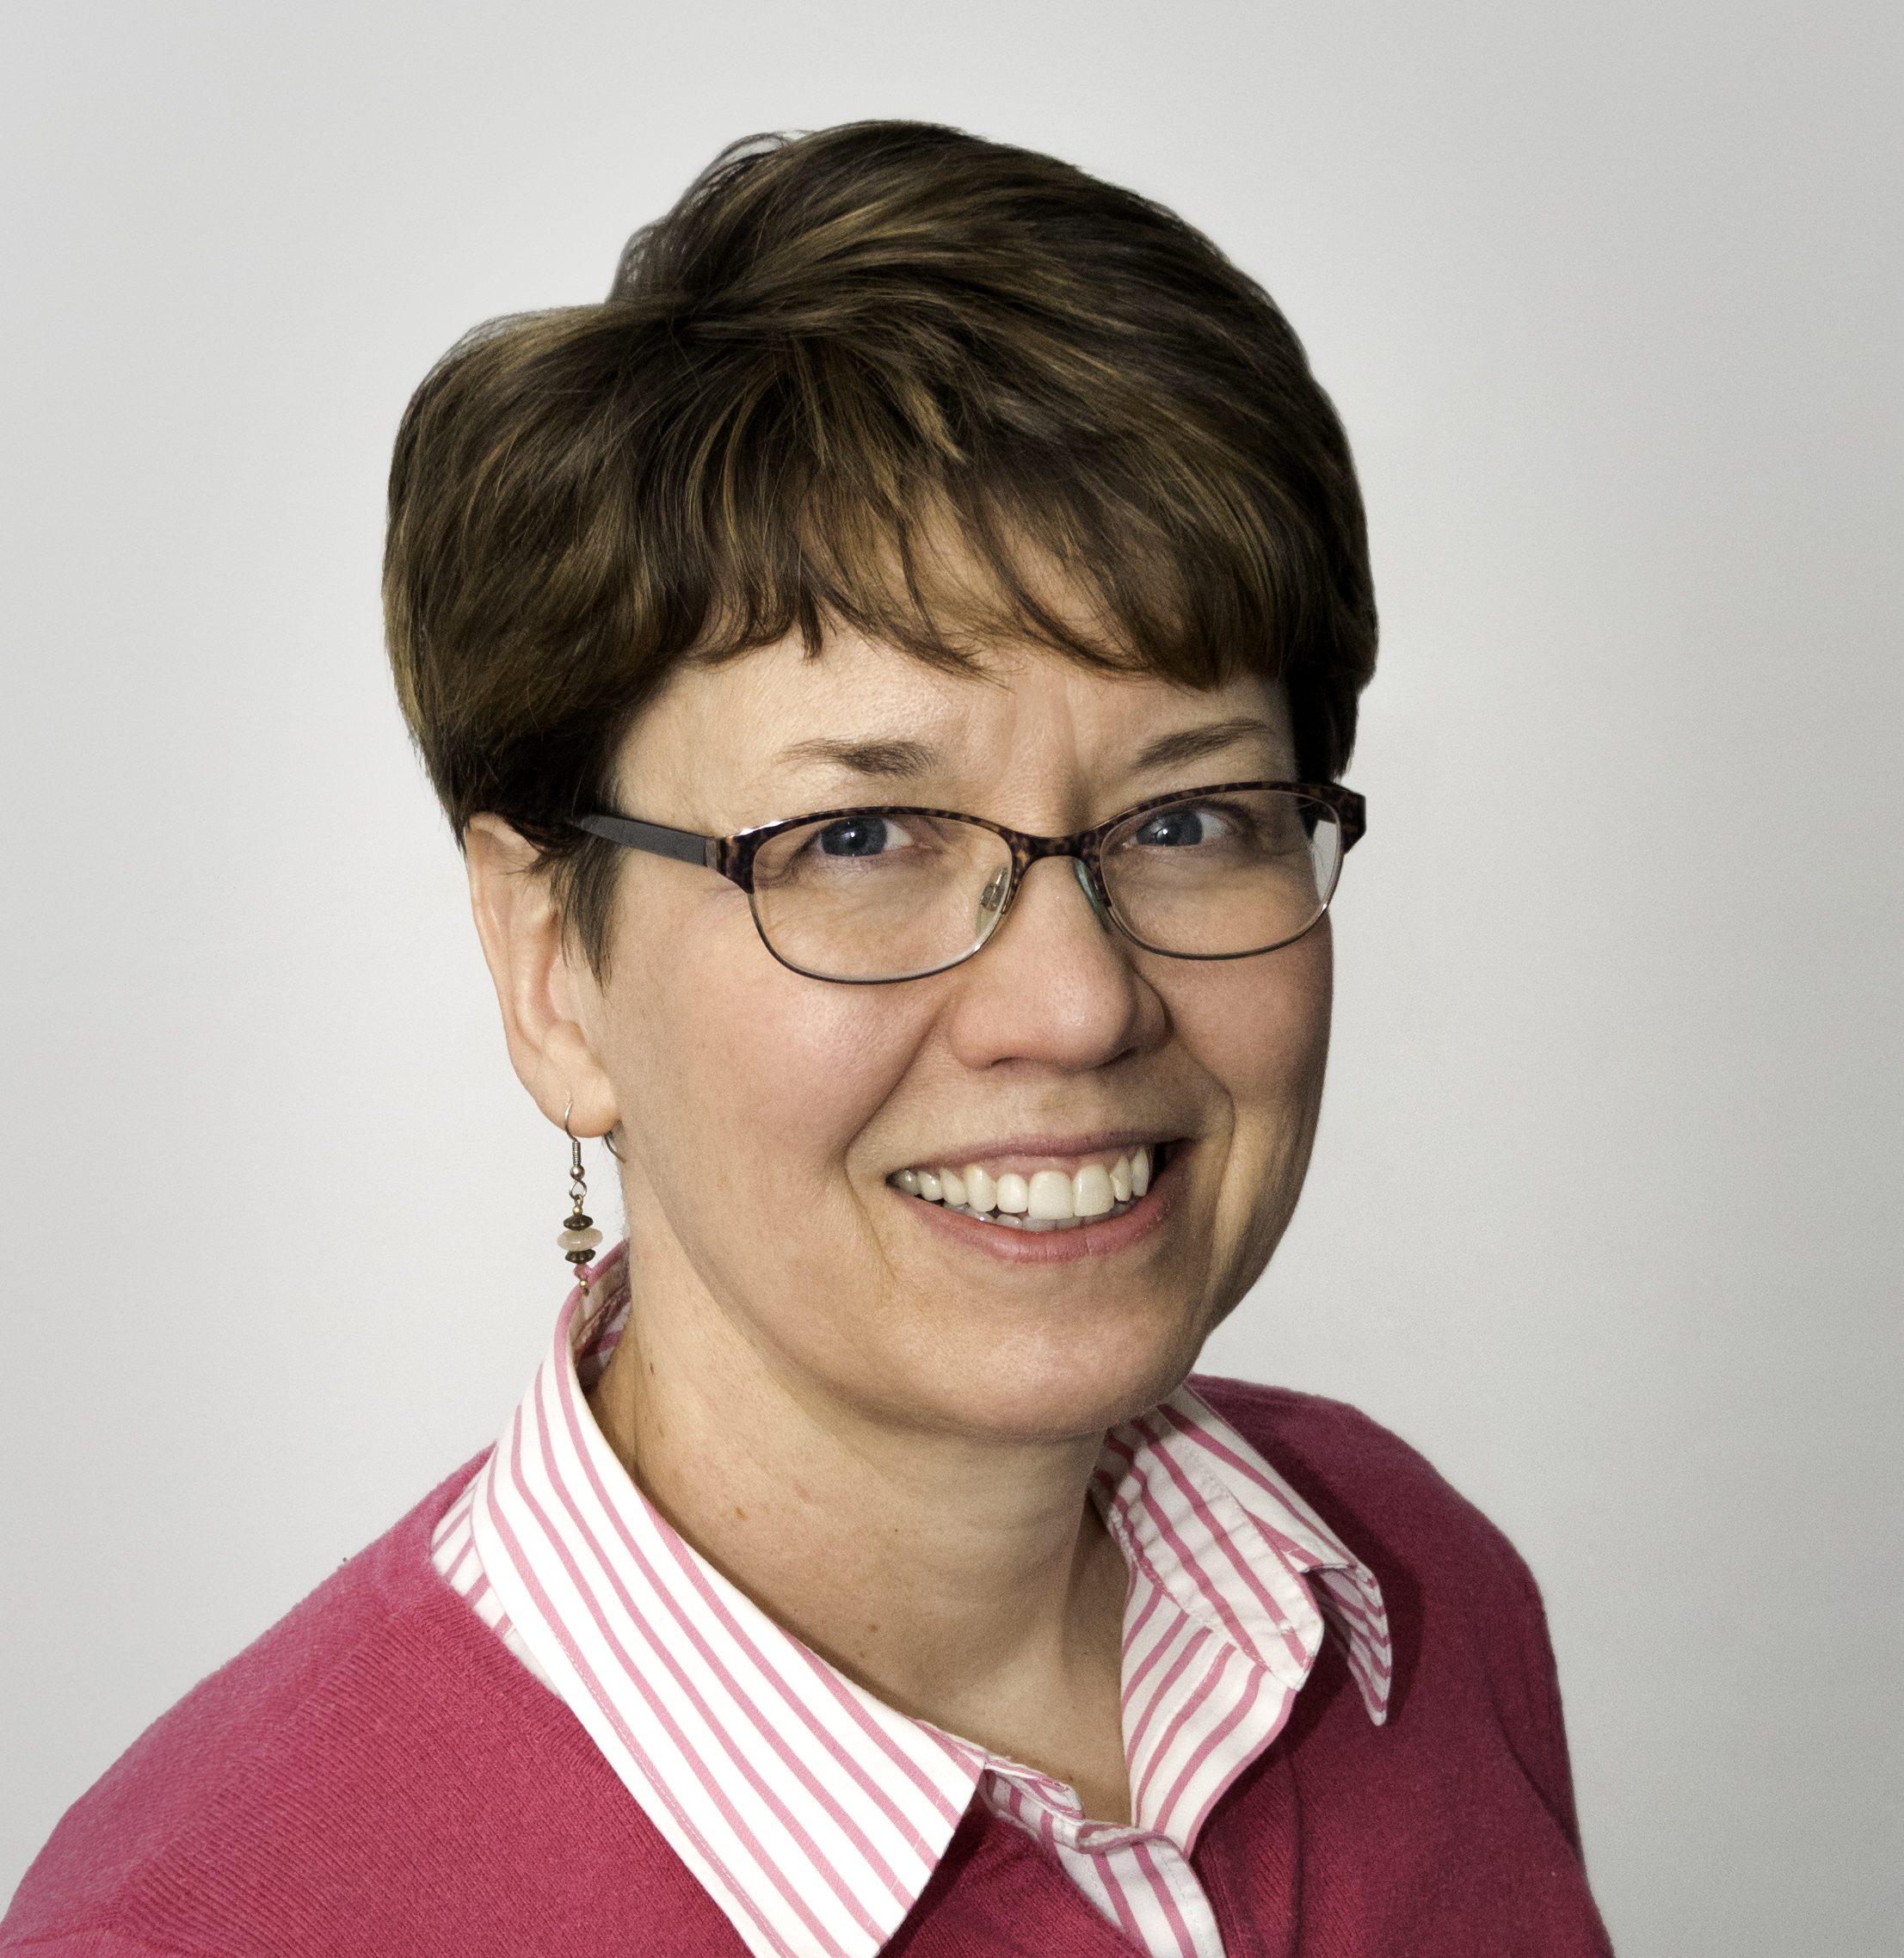 Sharon Knapp